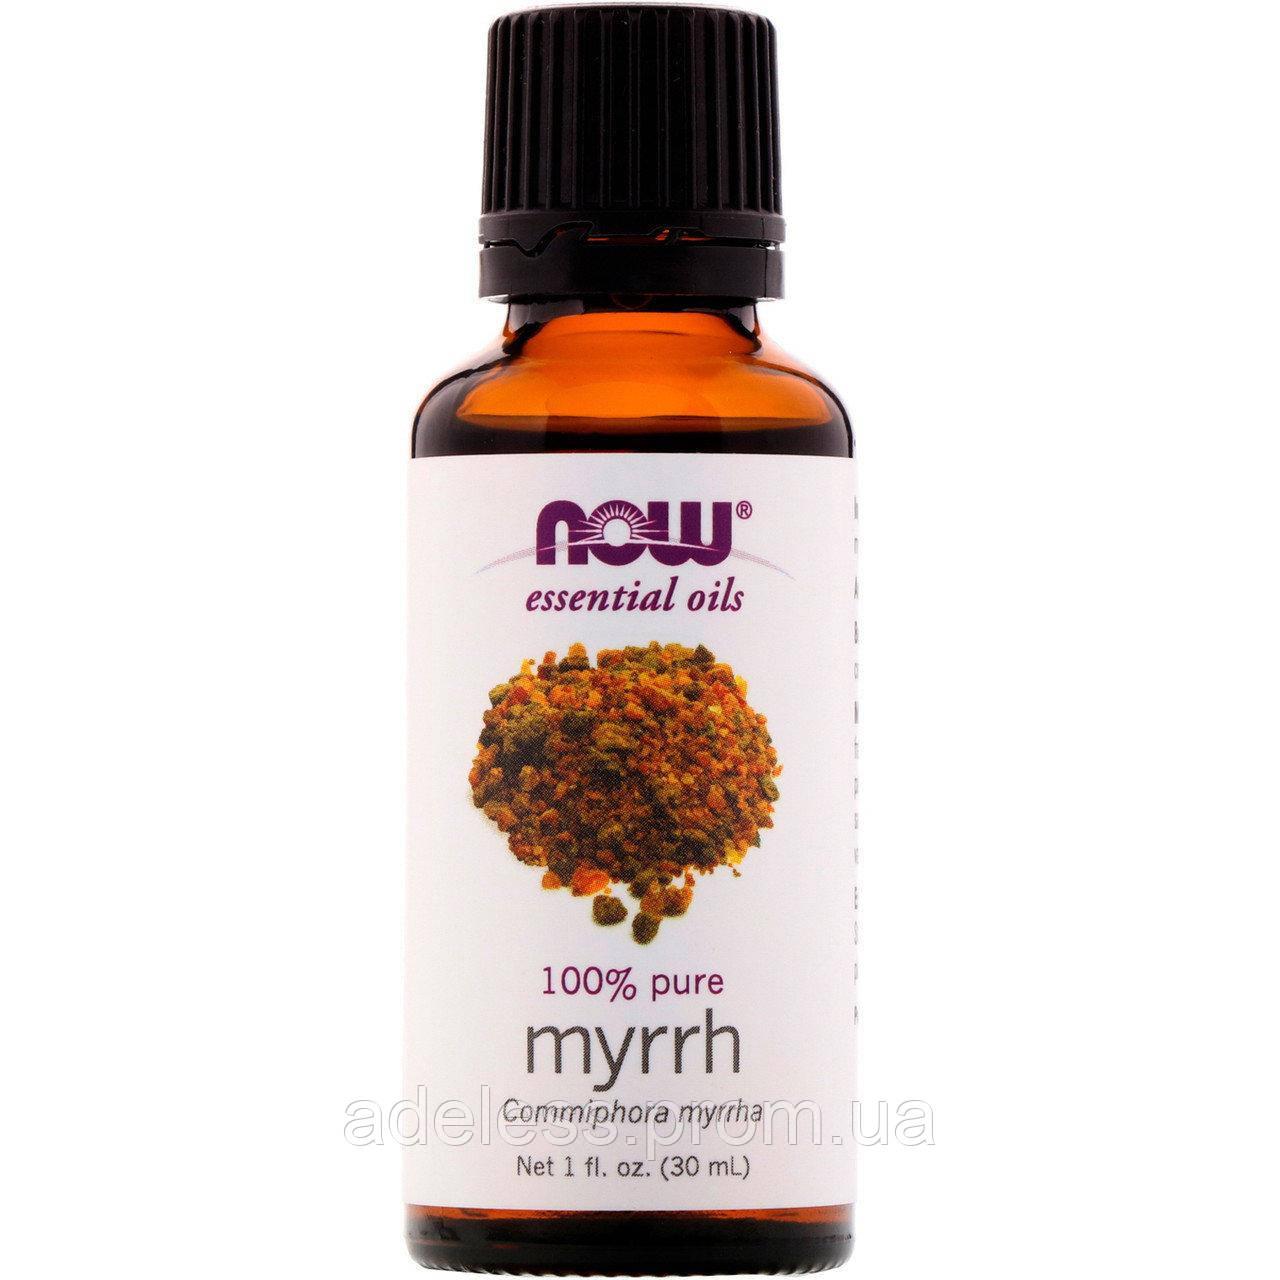 Эфирное масло Мирры Now Foods Murrh oil 100% pure, 30 мл